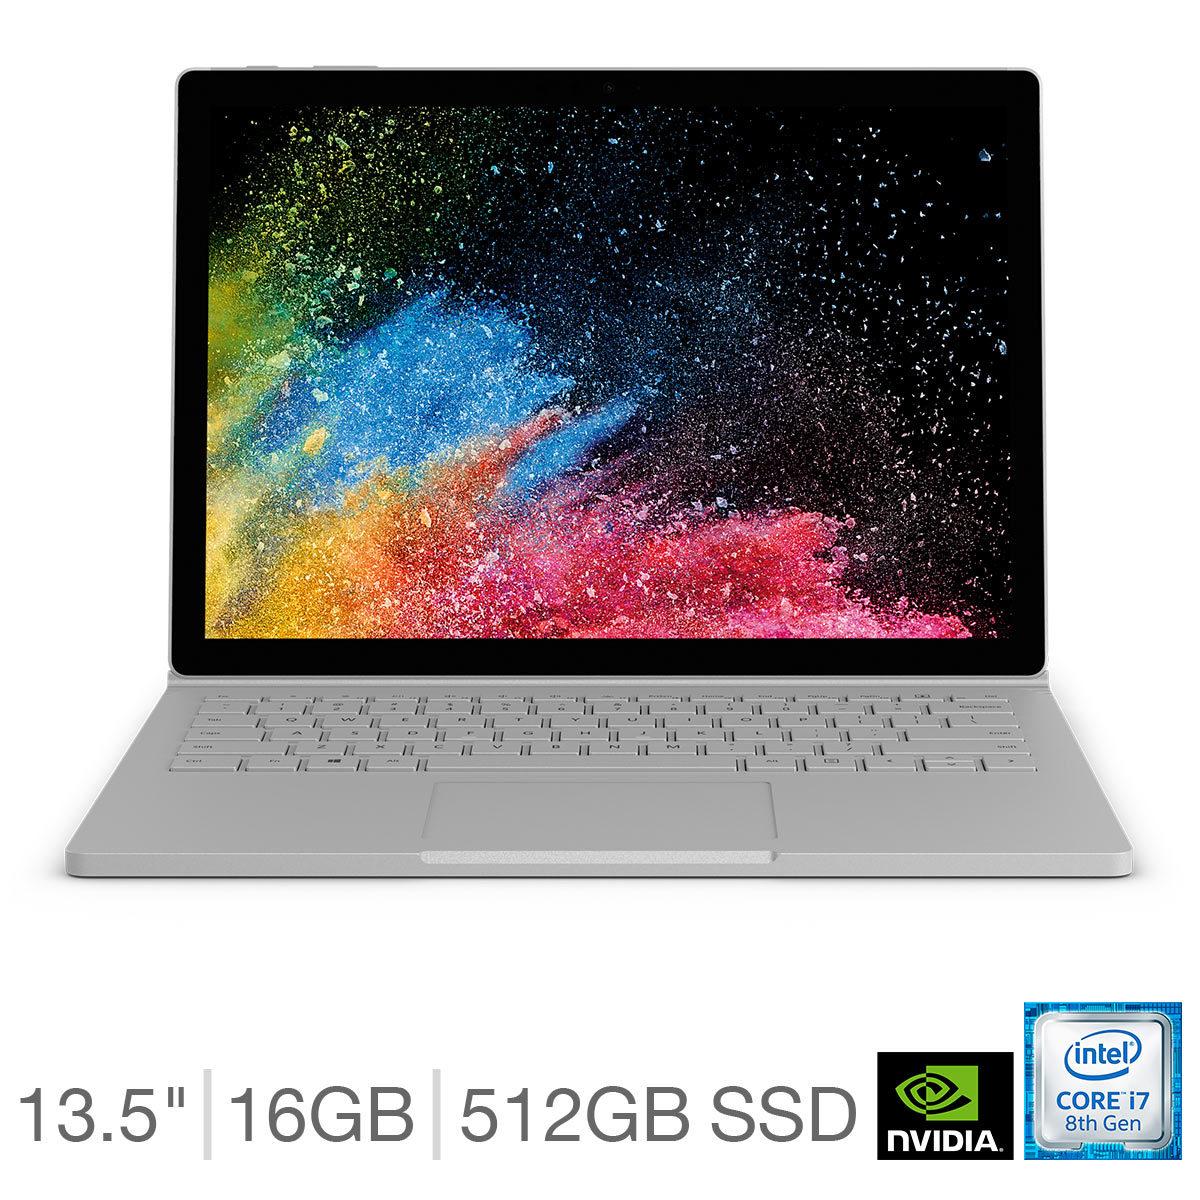 "Microsoft Surface Book 2 13.5"" i7-8650U, 16GB RAM, 512GB SSD @ Costco Online"